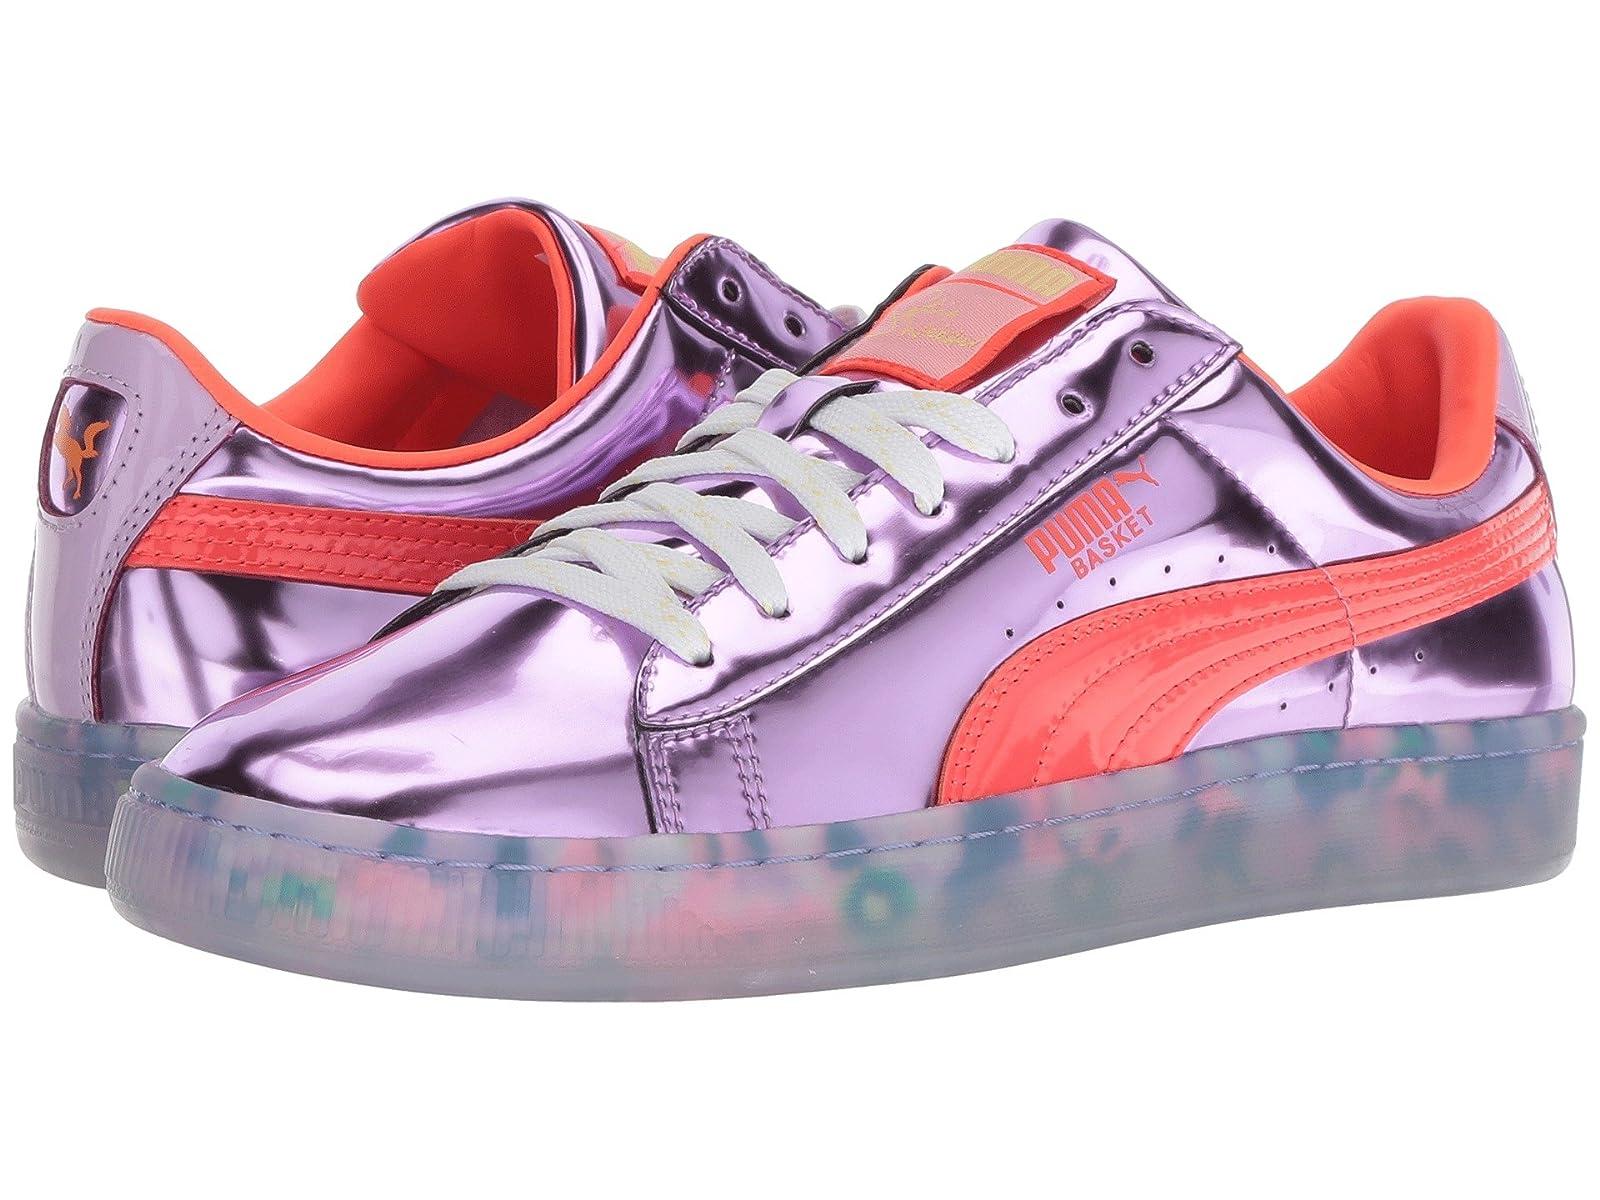 PUMA PUMA x Sophia Webster Basket Candy Princess SneakerAtmospheric grades have affordable shoes